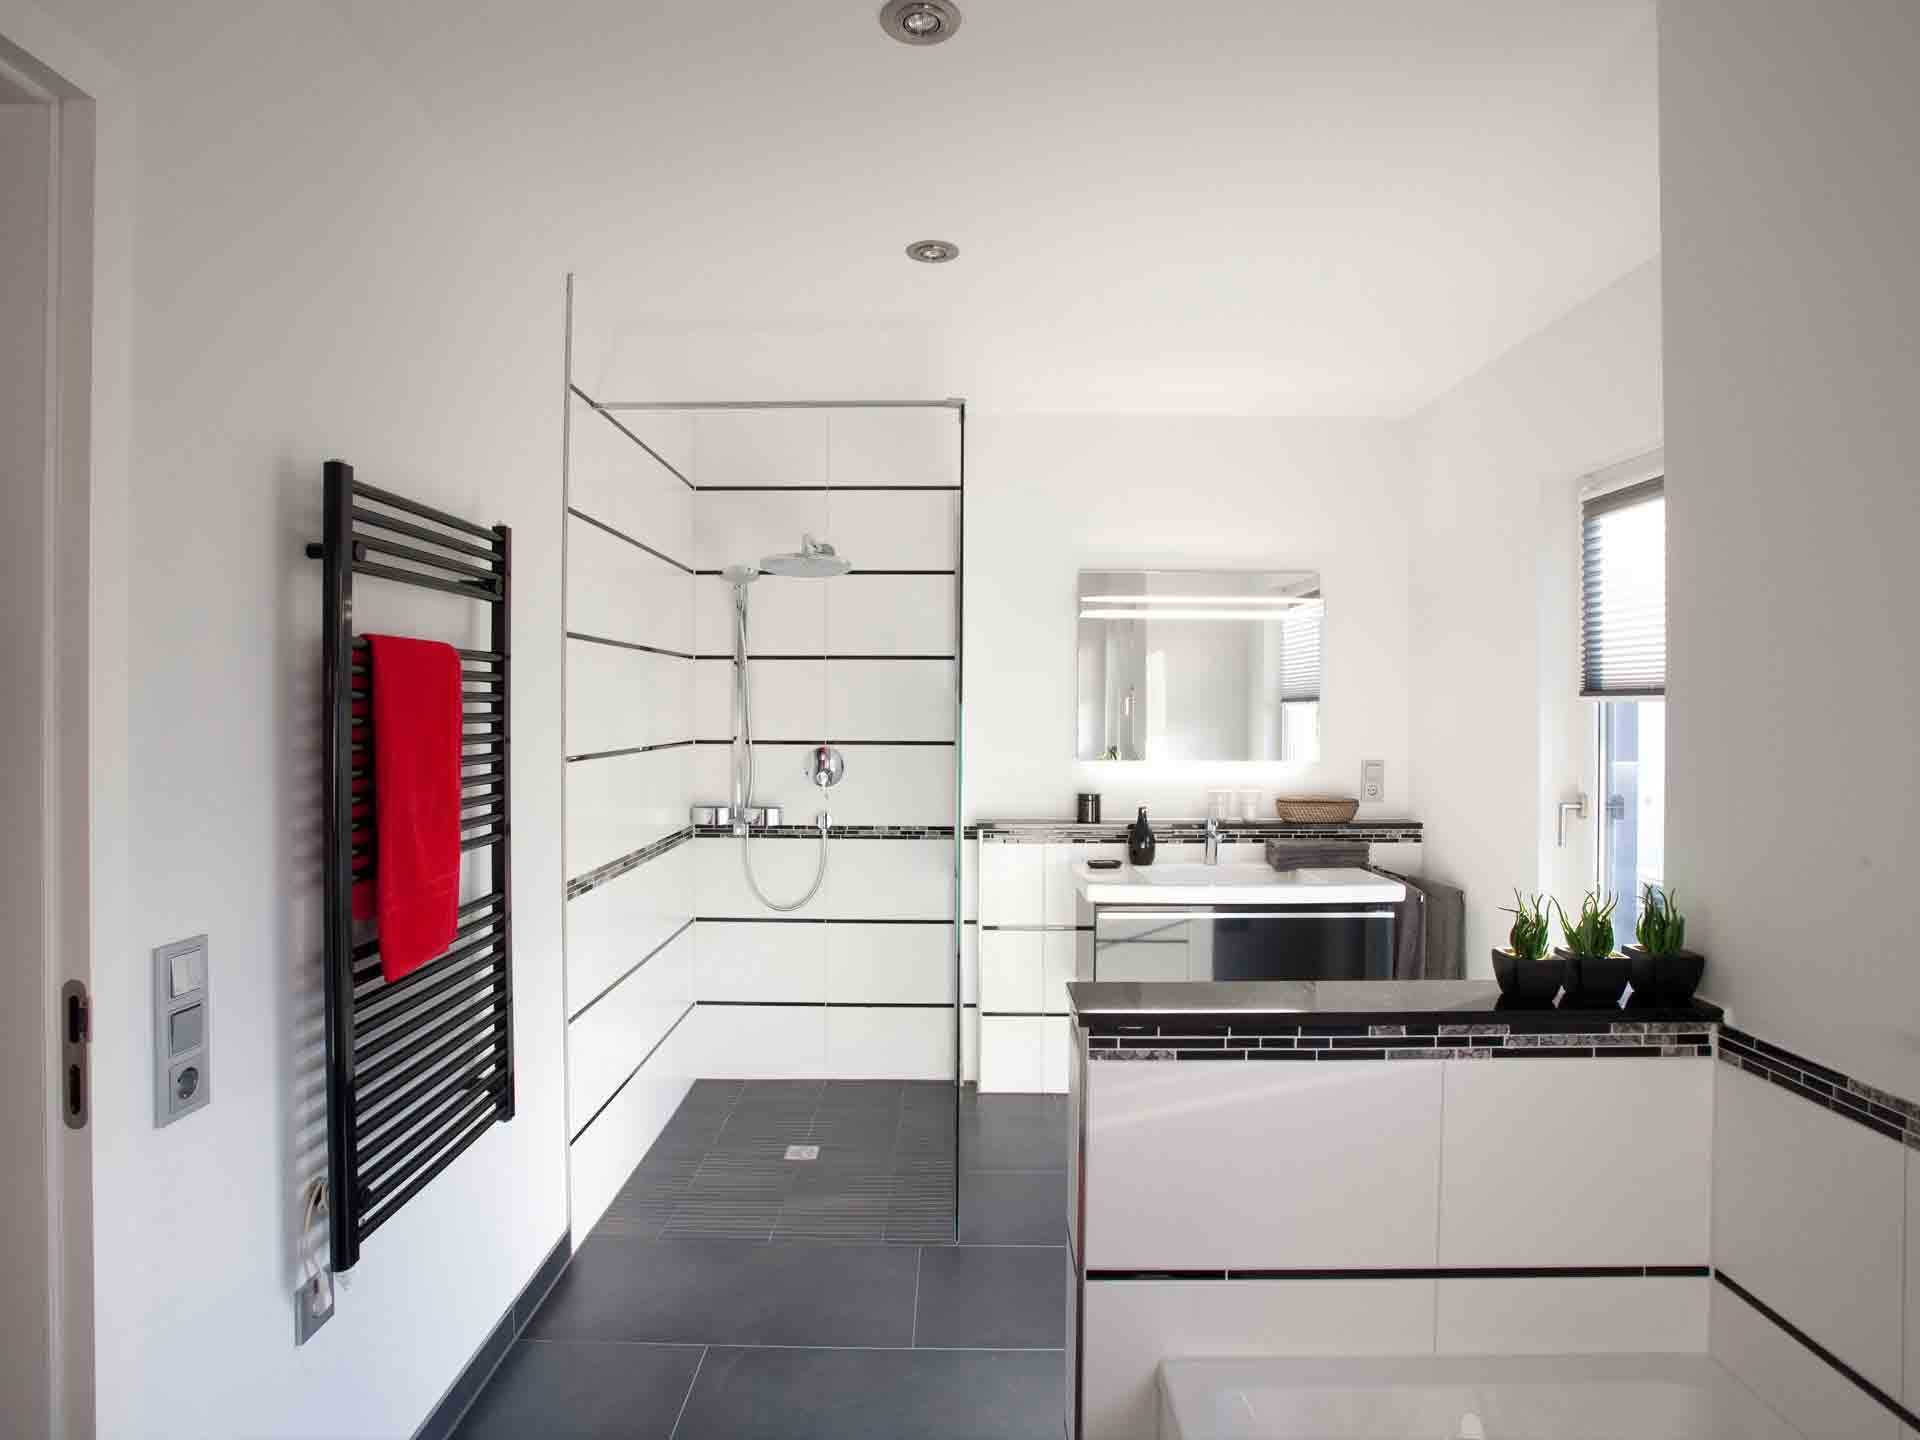 musterhaus k ln schwabenhaus. Black Bedroom Furniture Sets. Home Design Ideas